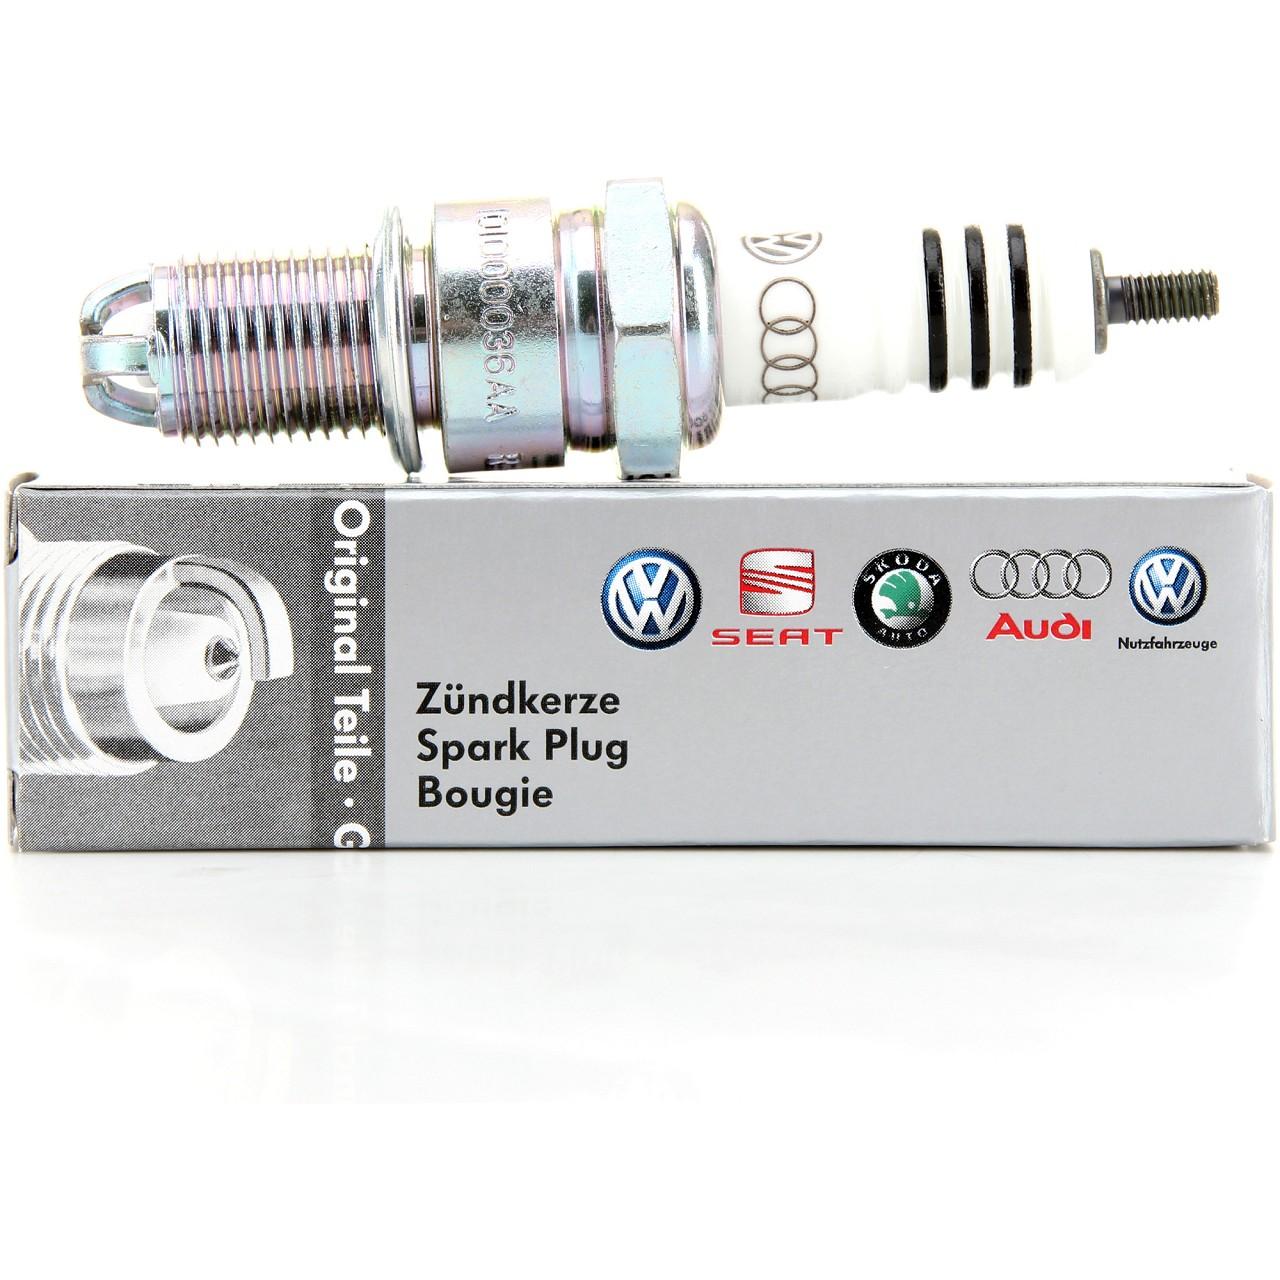 ORIGINAL VW Zündkerze Golf 1 2 3 Caddy Passat Polo T3 T4 Vento 101000036AA